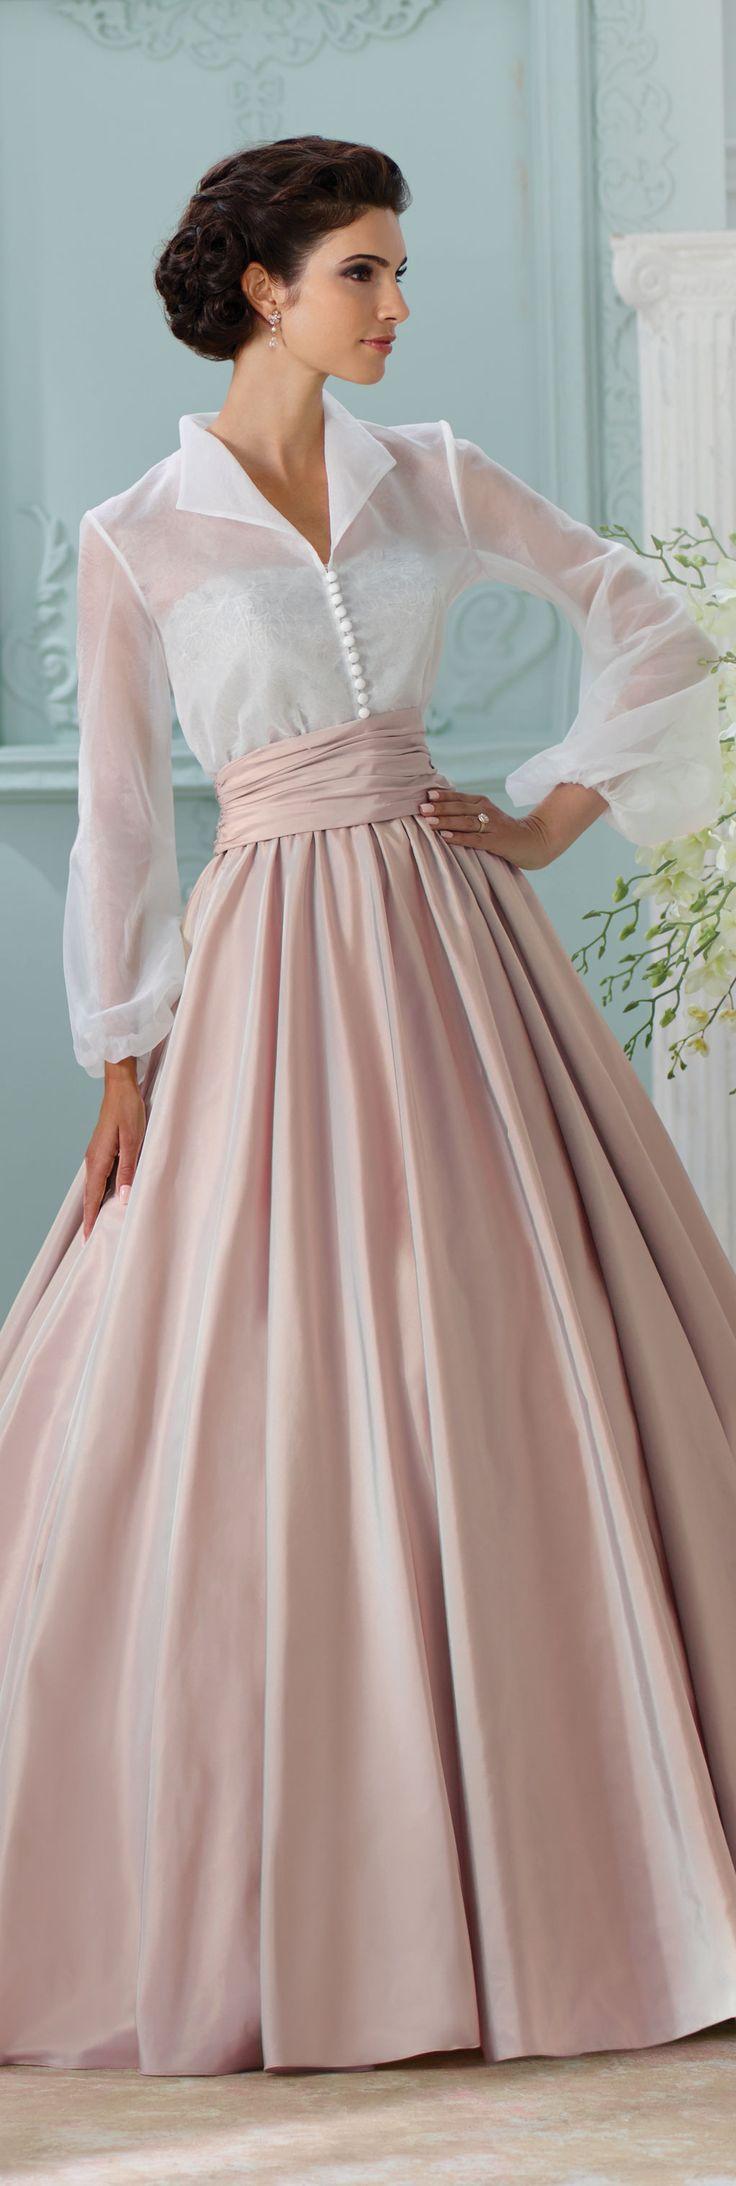 ball gown wedding dresses the david tutera for mon cheri